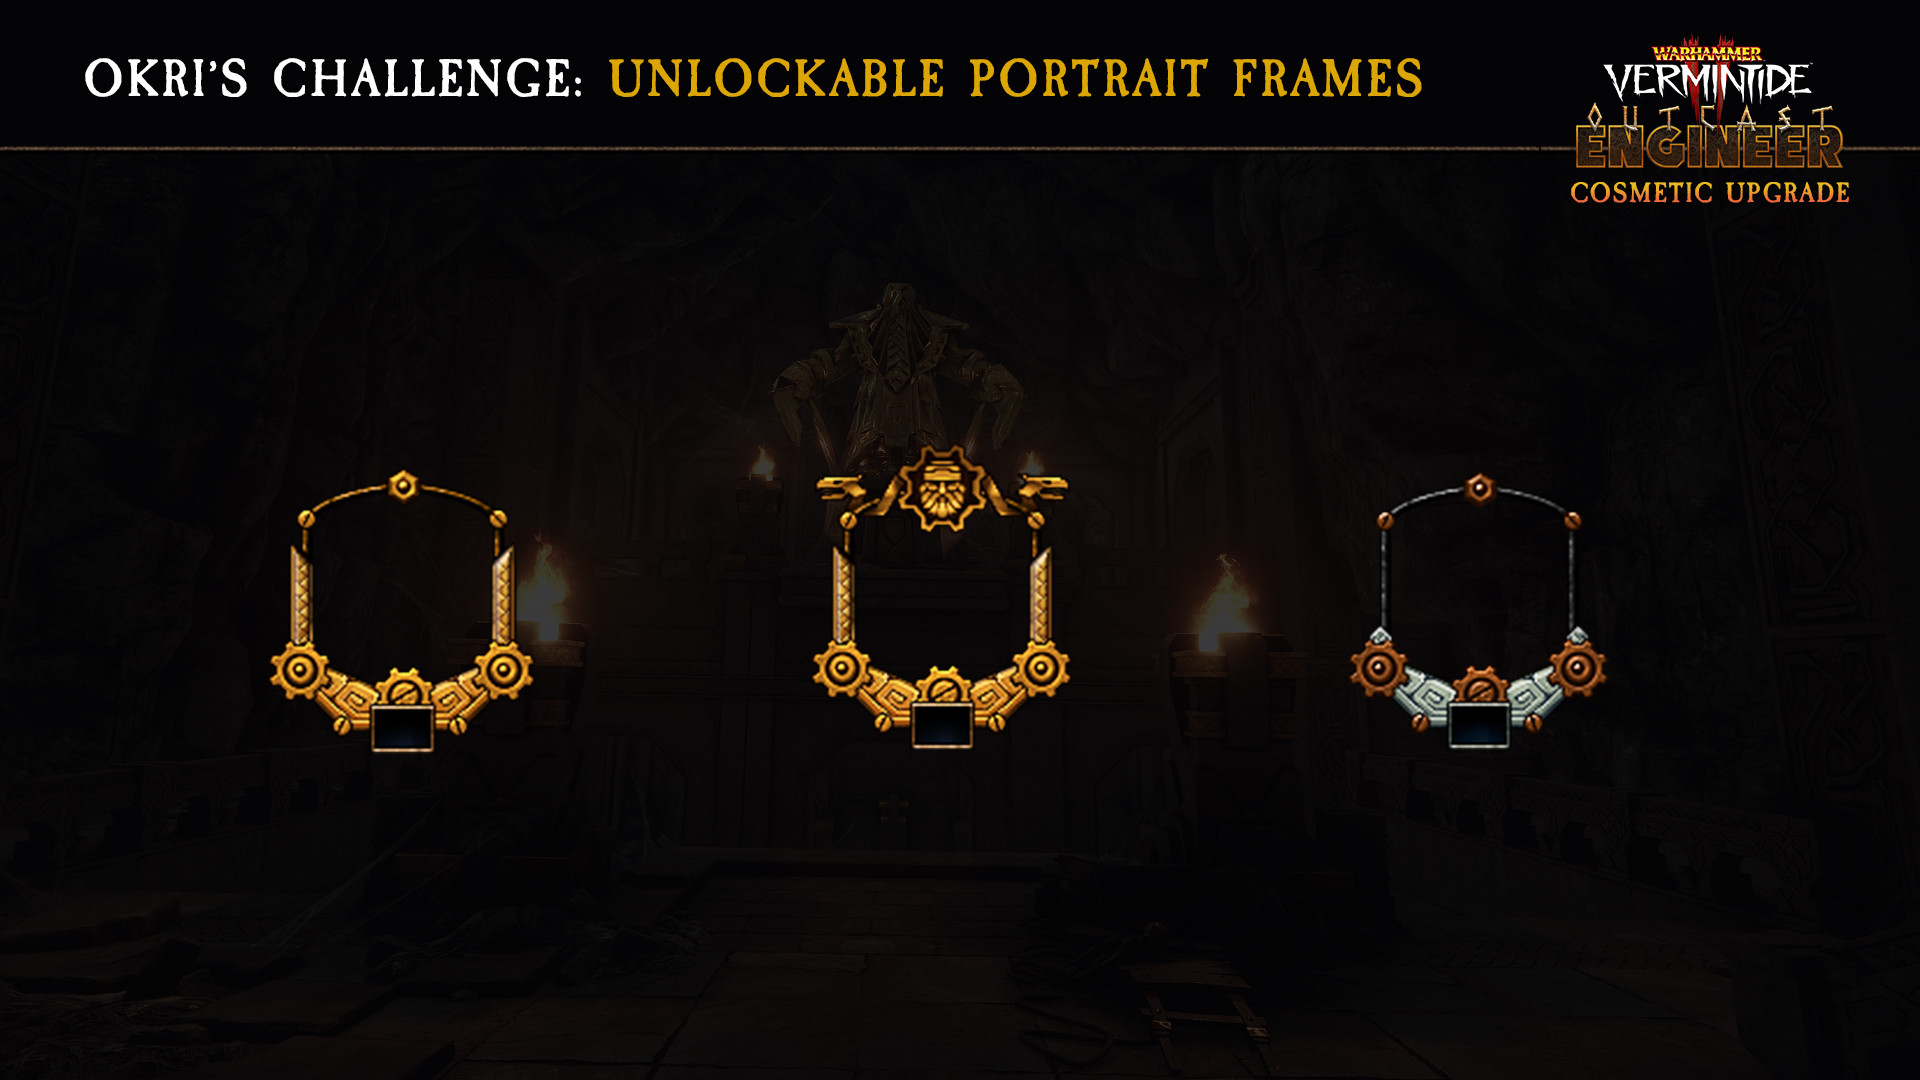 Warhammer: Vermintide 2 - Outcast Engineer Cosmetic Upgrade screenshot